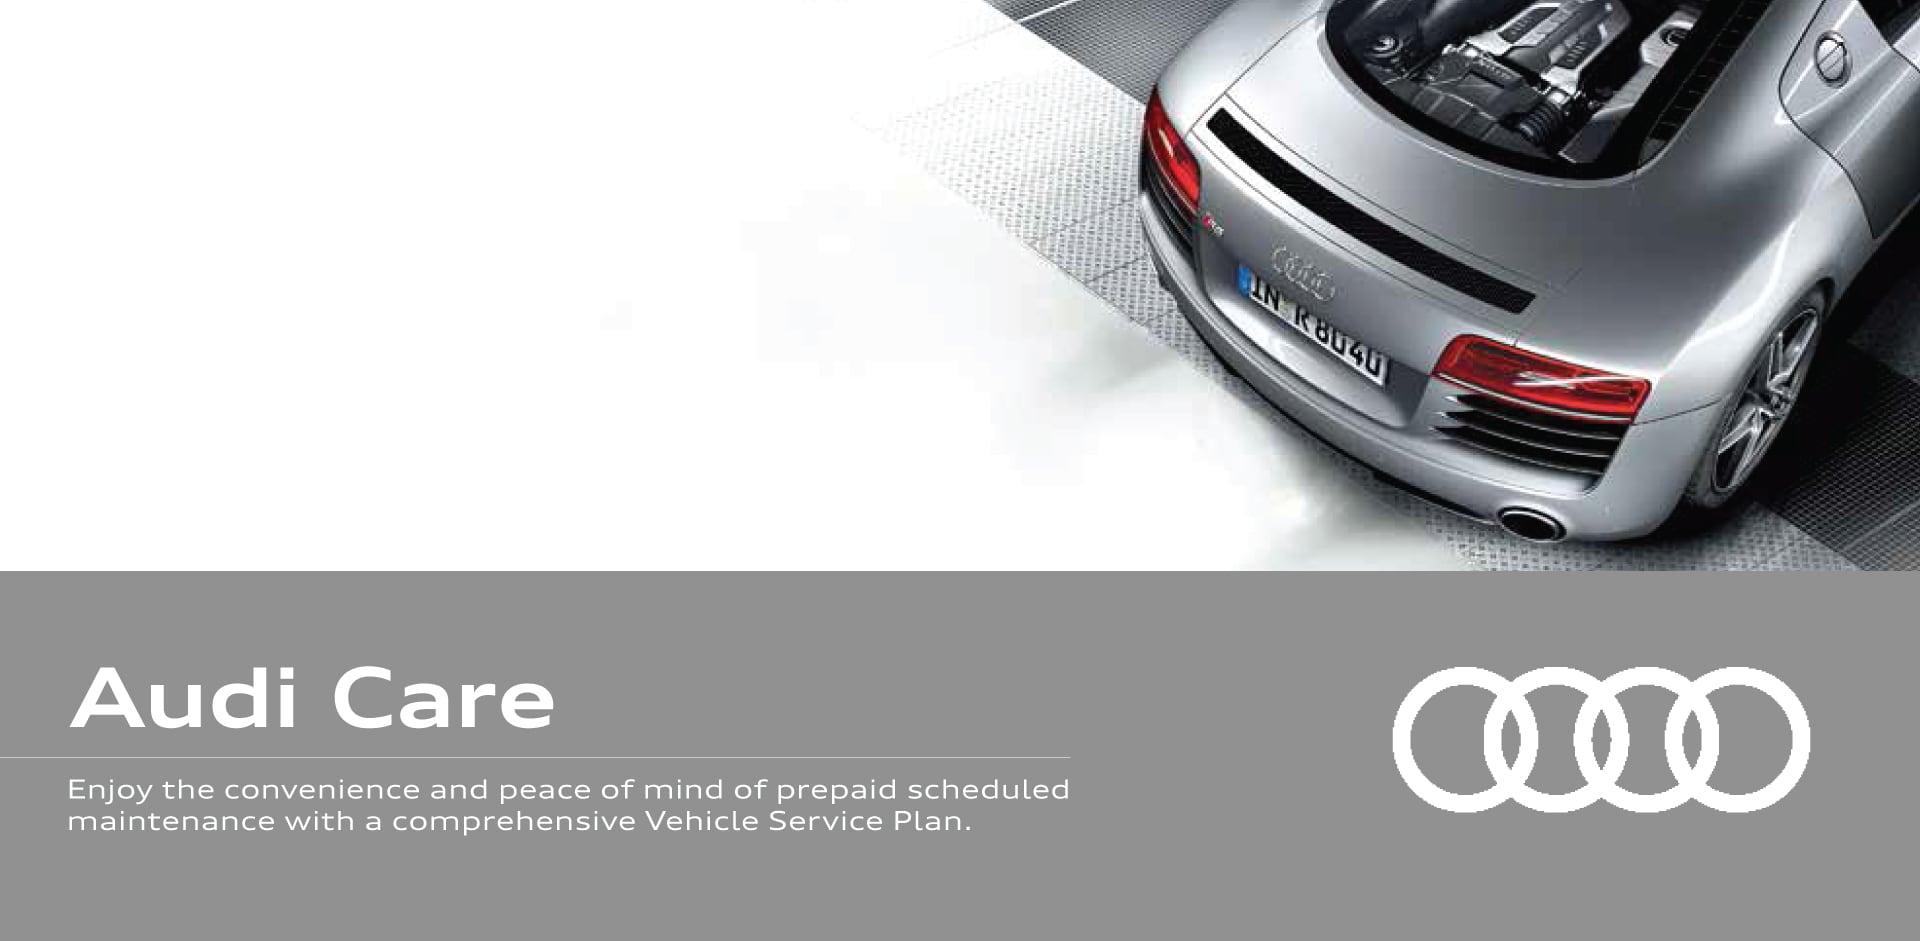 Audi Midtown Toronto | Vehicles for sale in Toronto, ON M2J 4R2